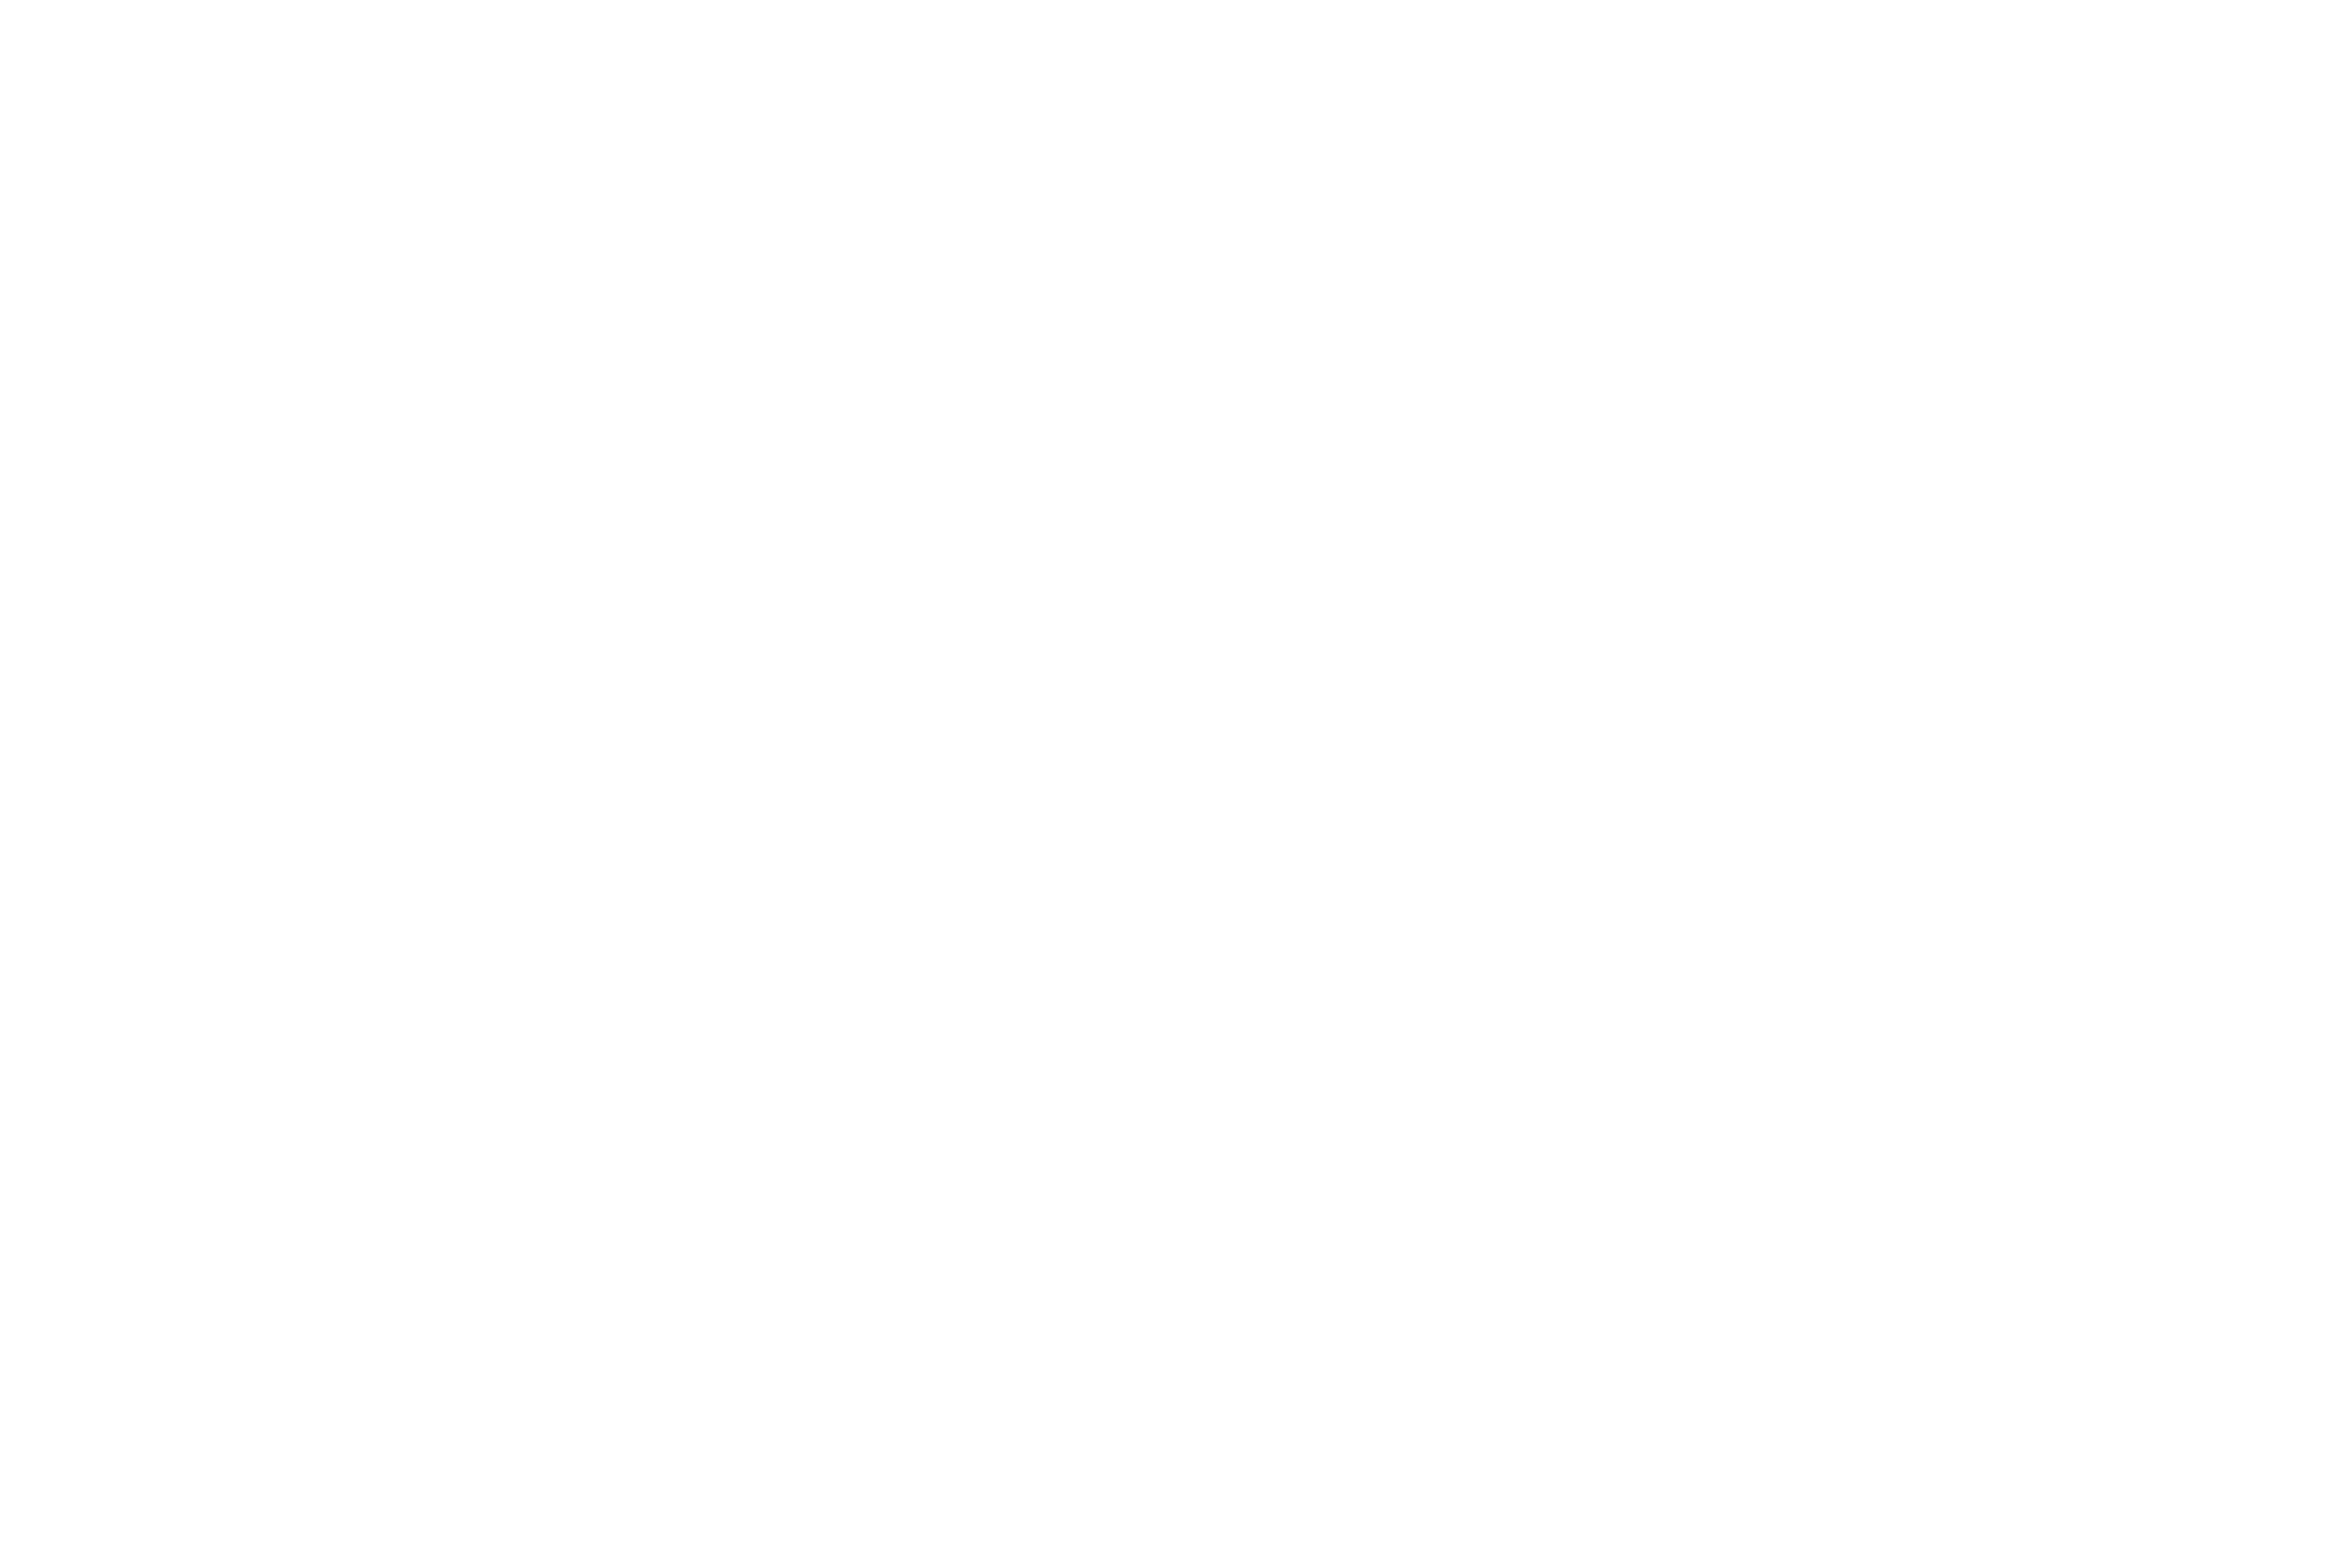 Aktuelle Corona-Information